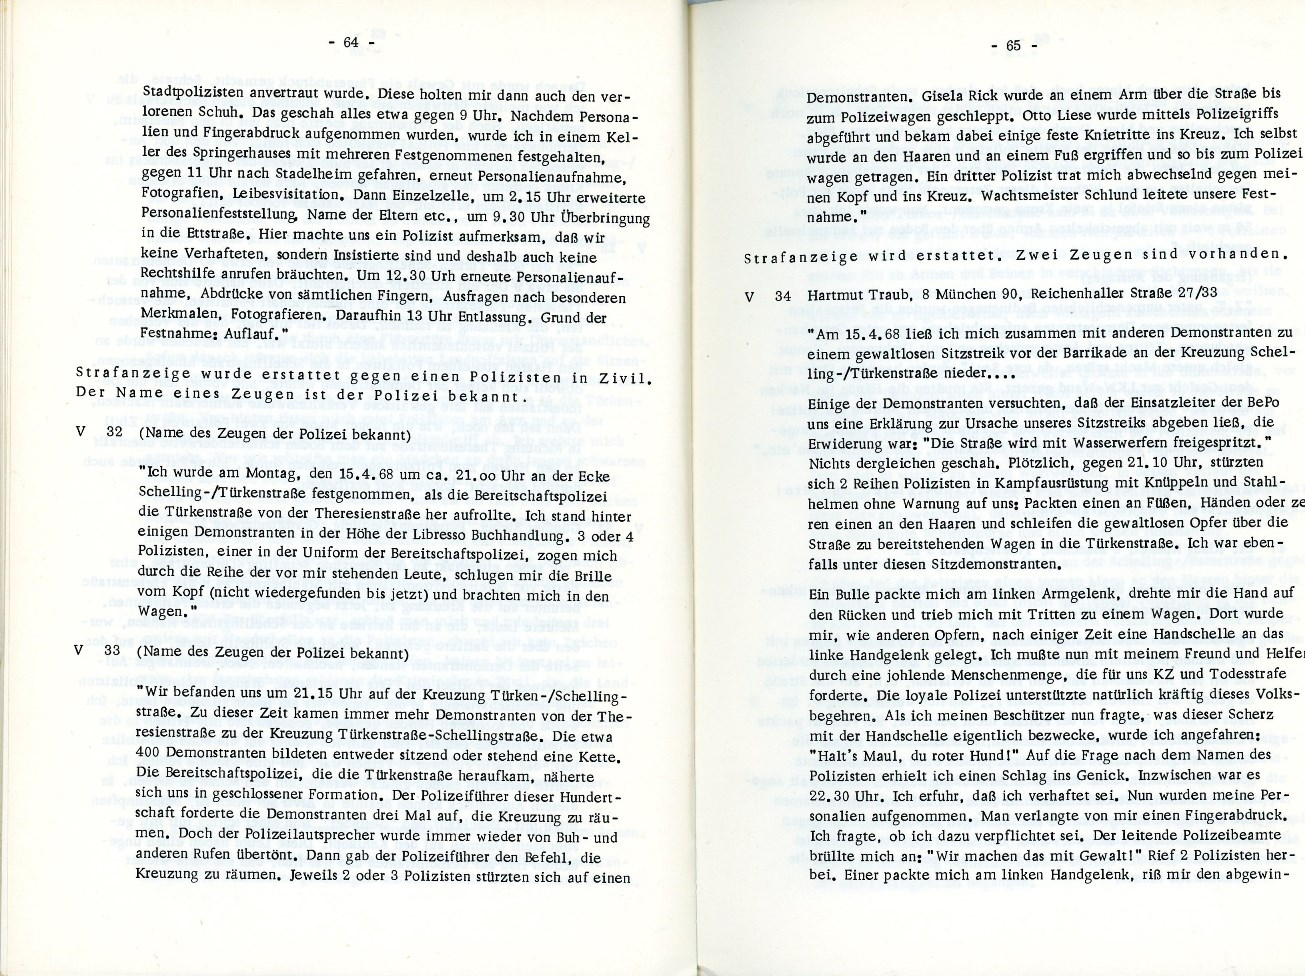 Muenchen_Doku_Osterdemonstrationen_1968_35